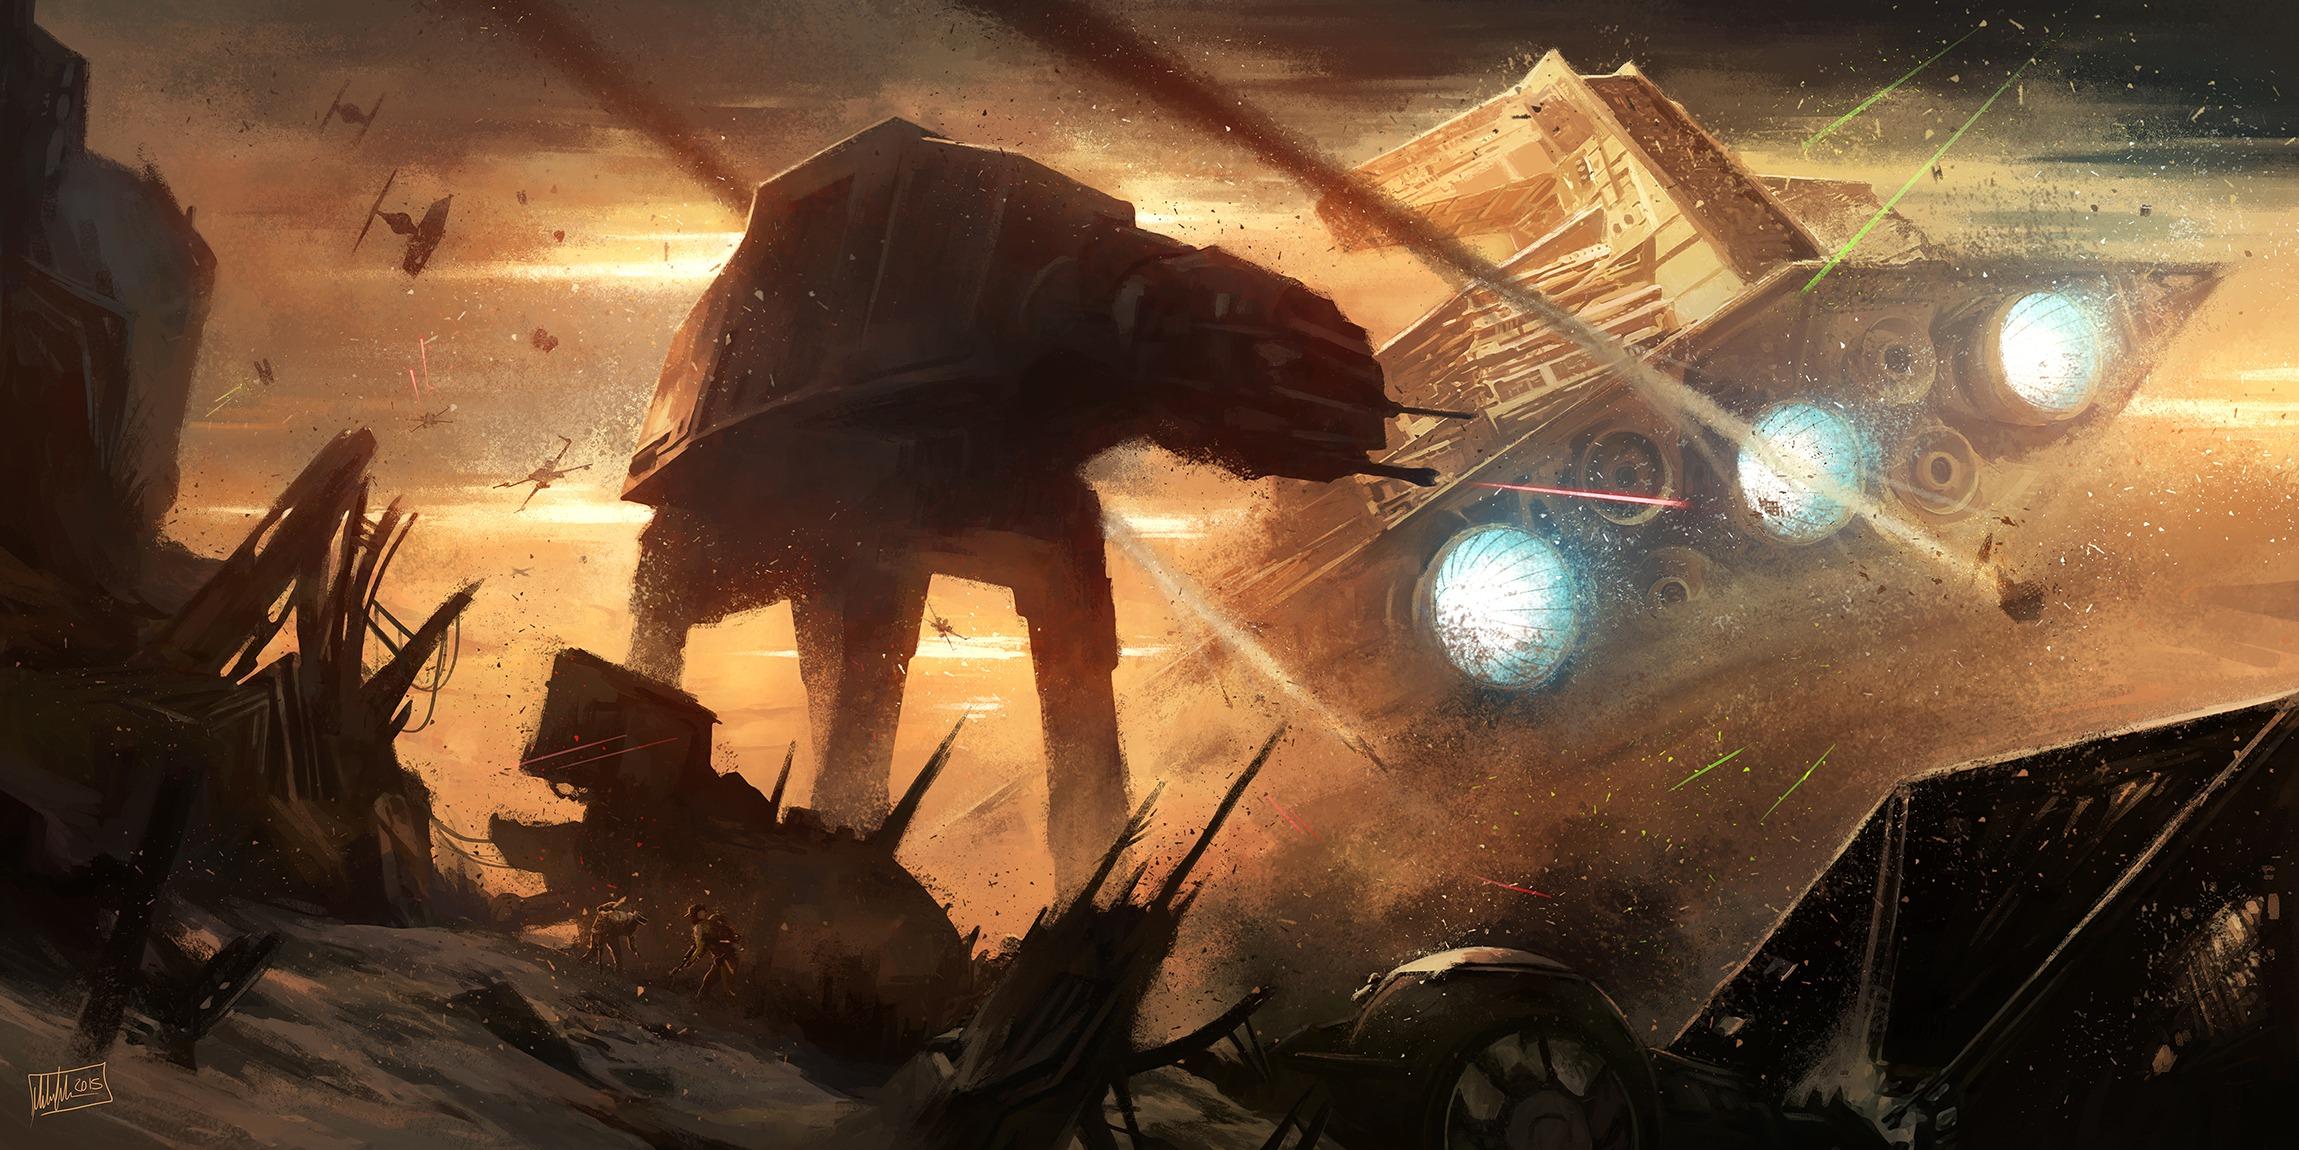 Battle of Jakku HD Wallpaper Background Image 2299x1150 ID 2299x1150